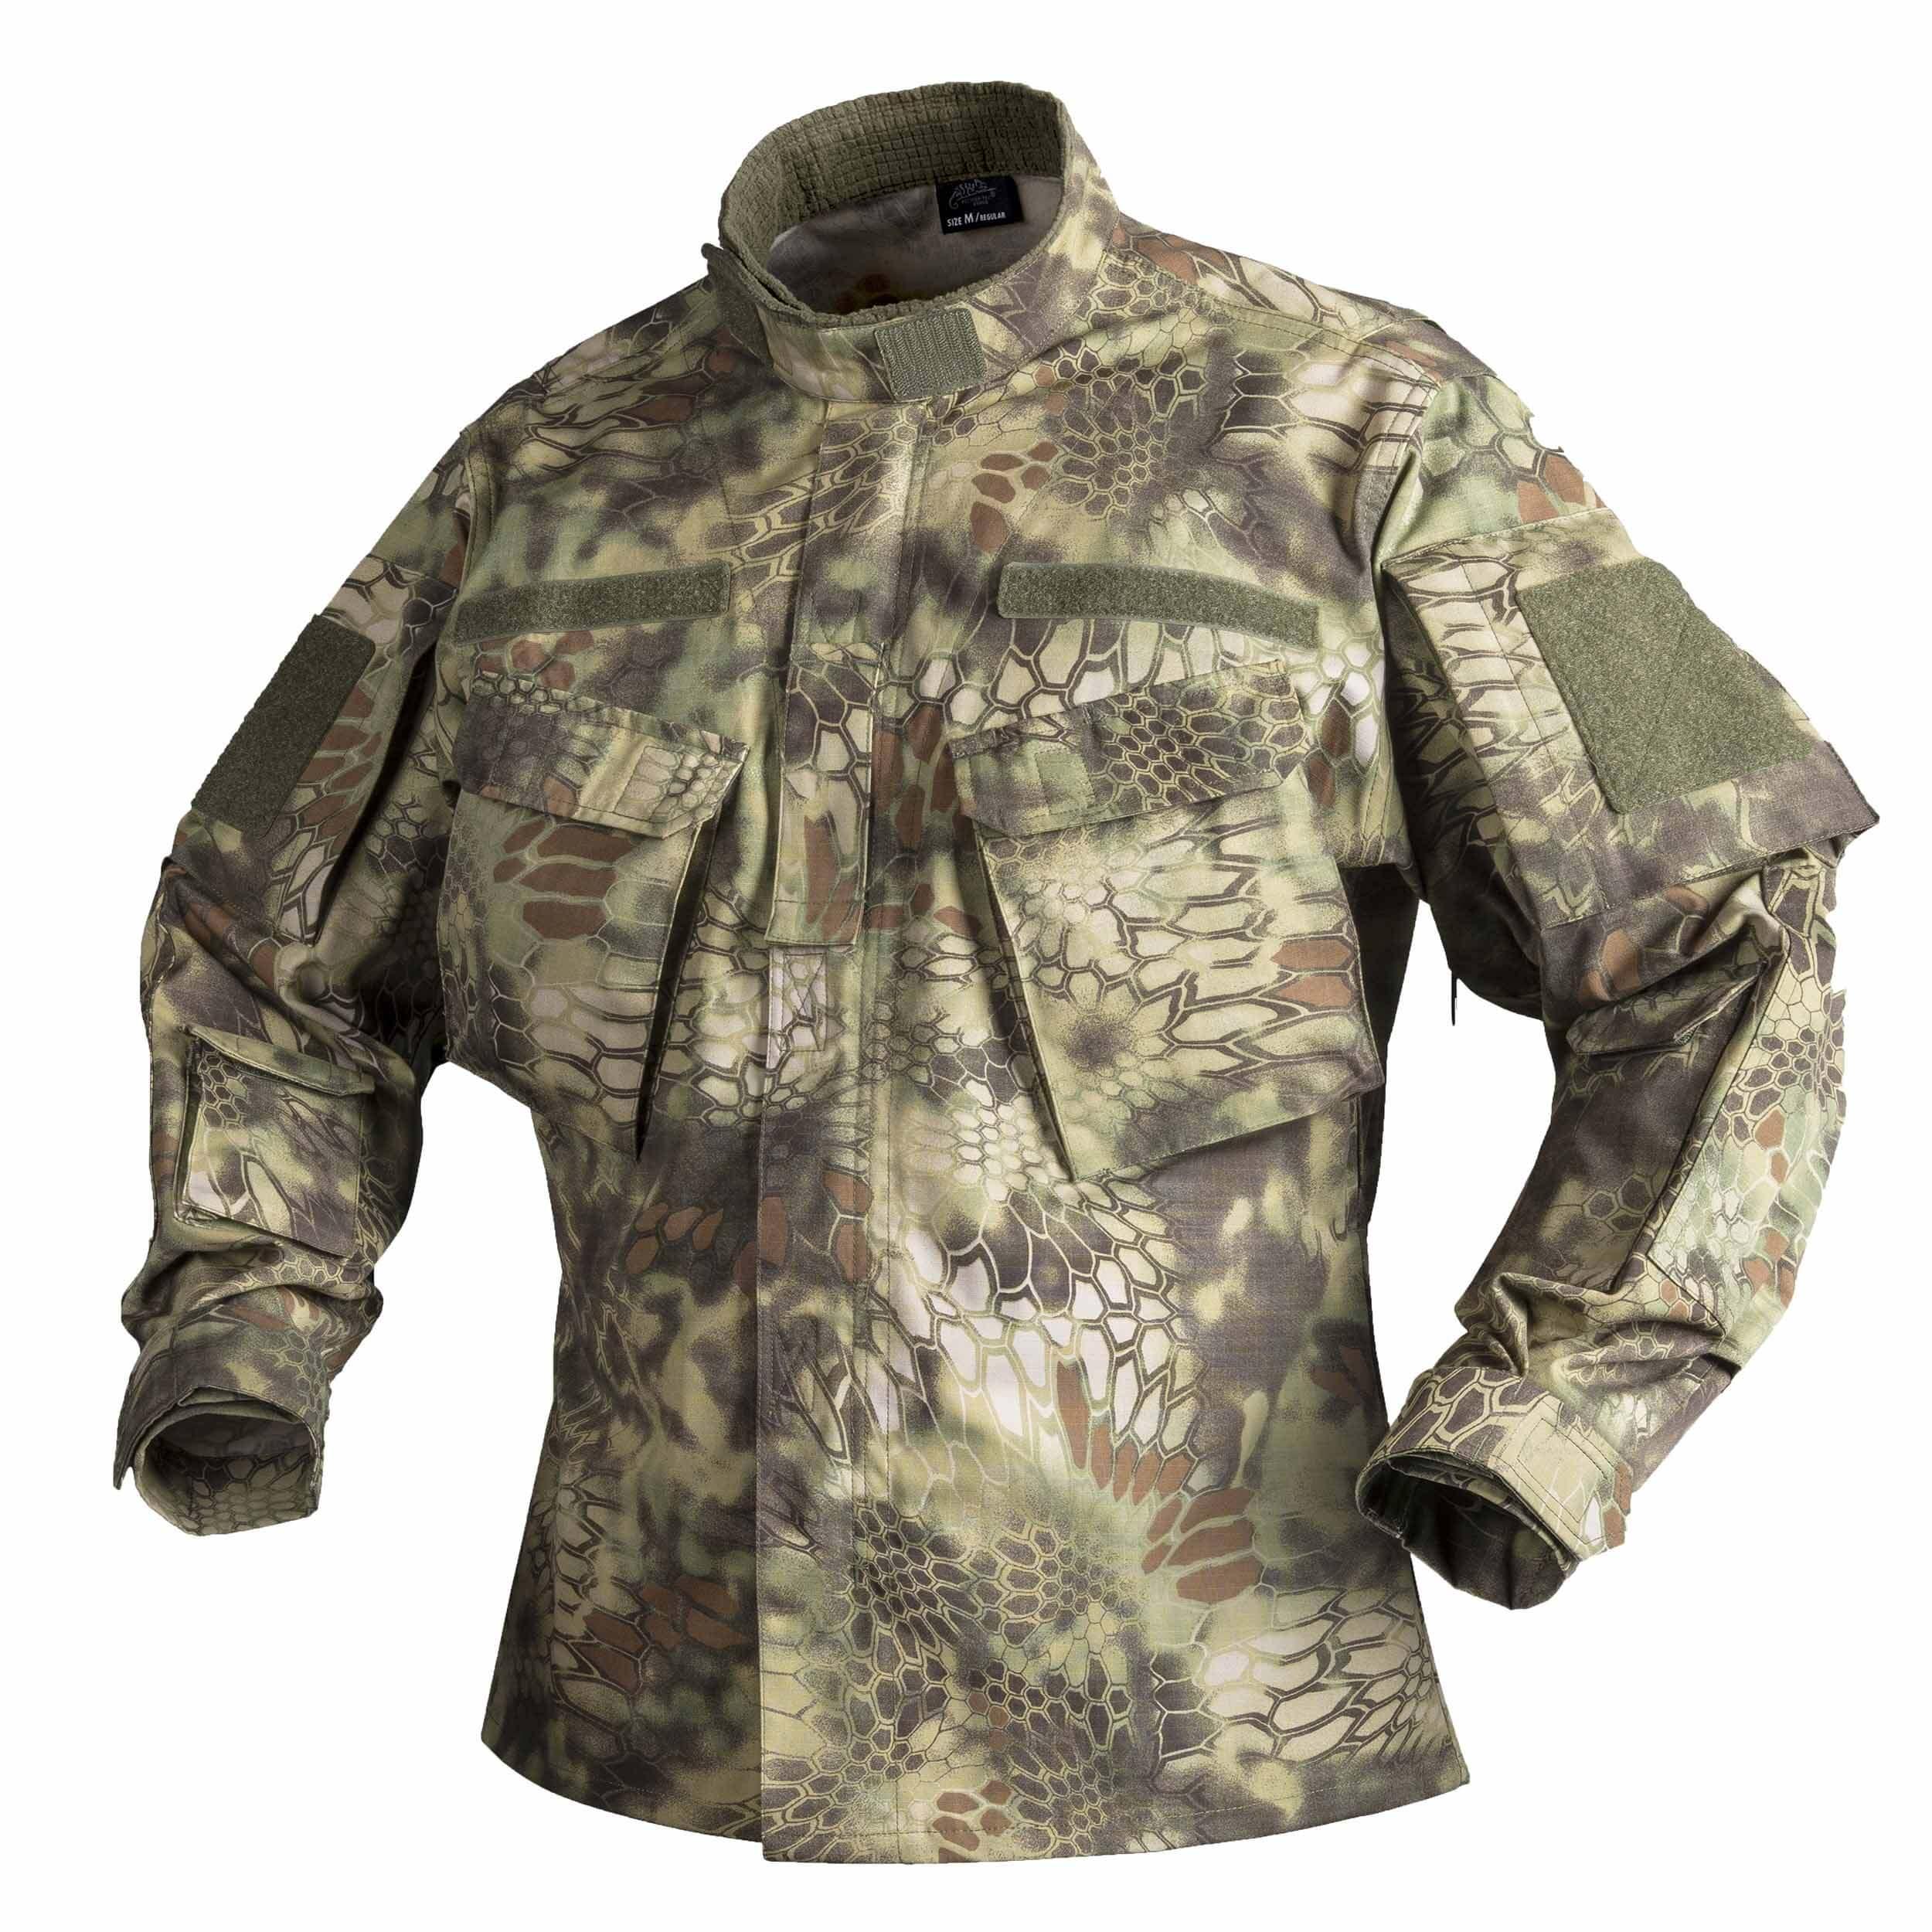 Helikon-Tex CPU Shirt - NyCo Ripstop - Kryptek Mandrake